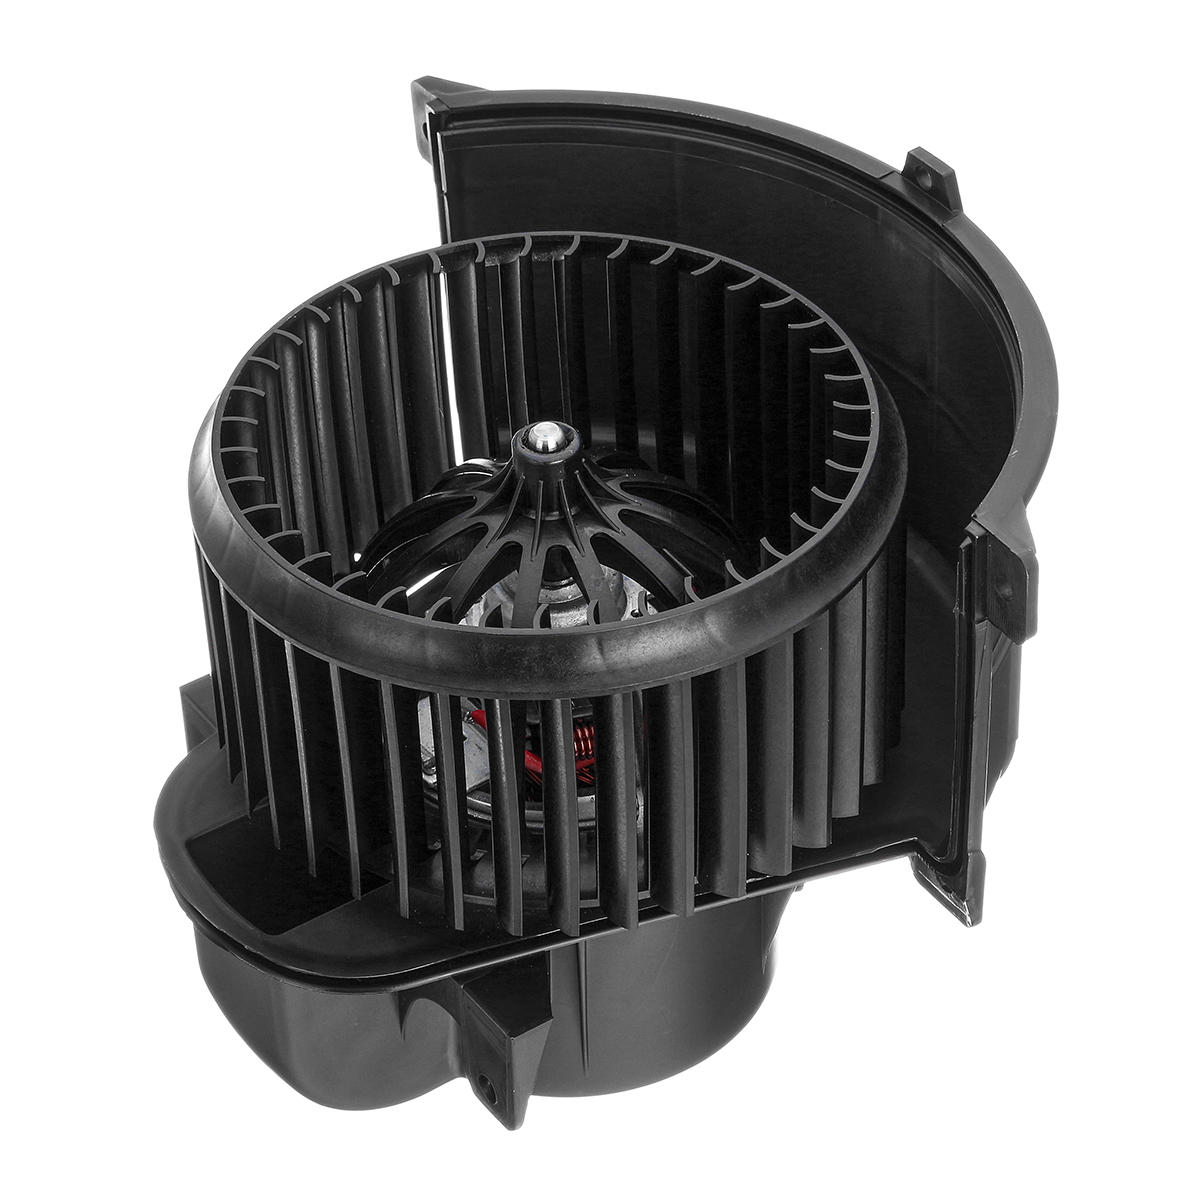 RHD Delantero Derecho Calentador Blower Plastic Black motor y Jaula Para Audi Q7 VW Touareg